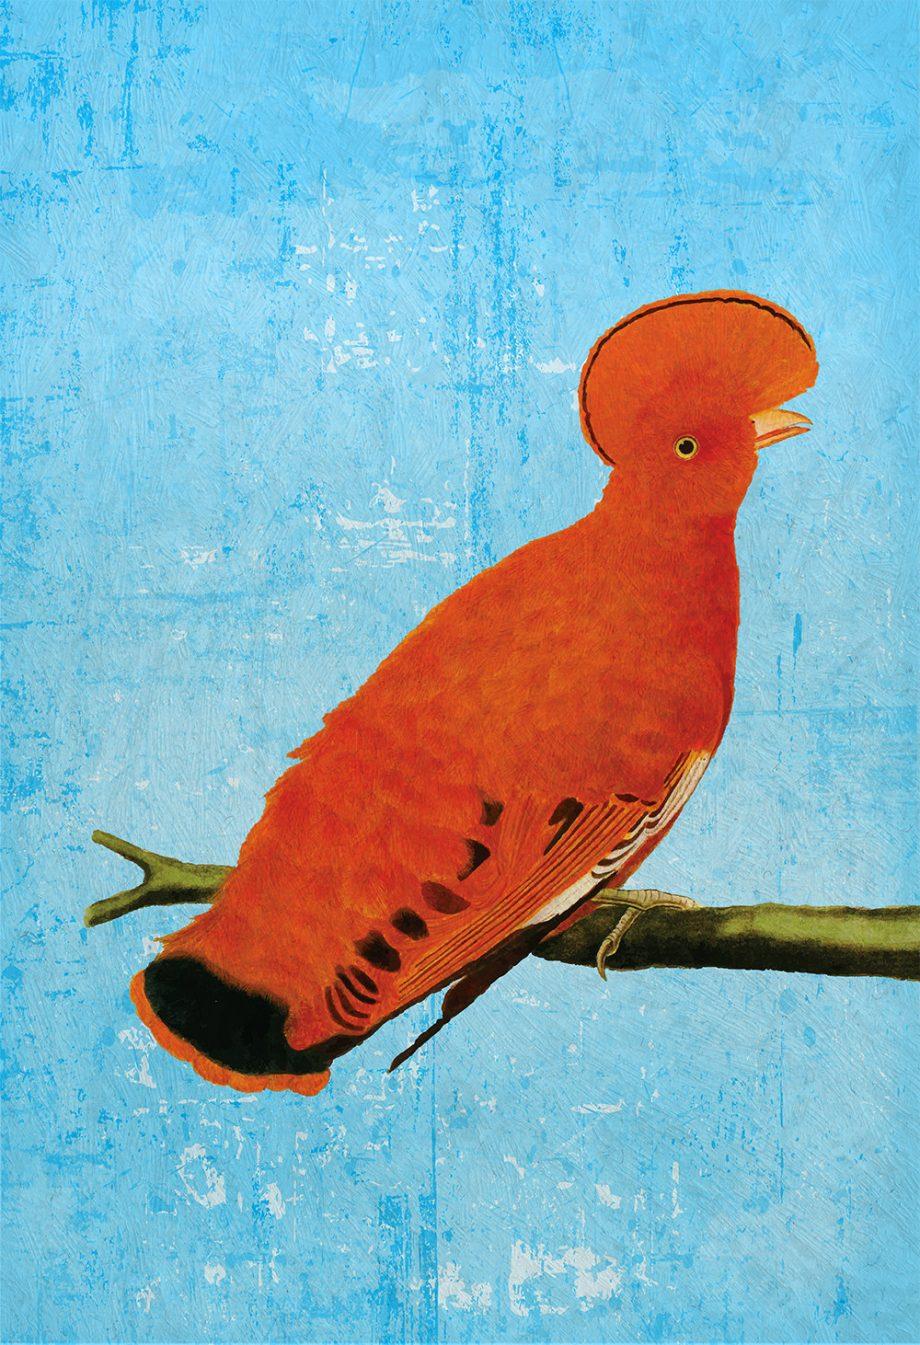 Vintage Martinet Print Antique Bird Print Vintage Bird Prints Illustrated Bird Print Bird Wall Decor Natural History Wall Art